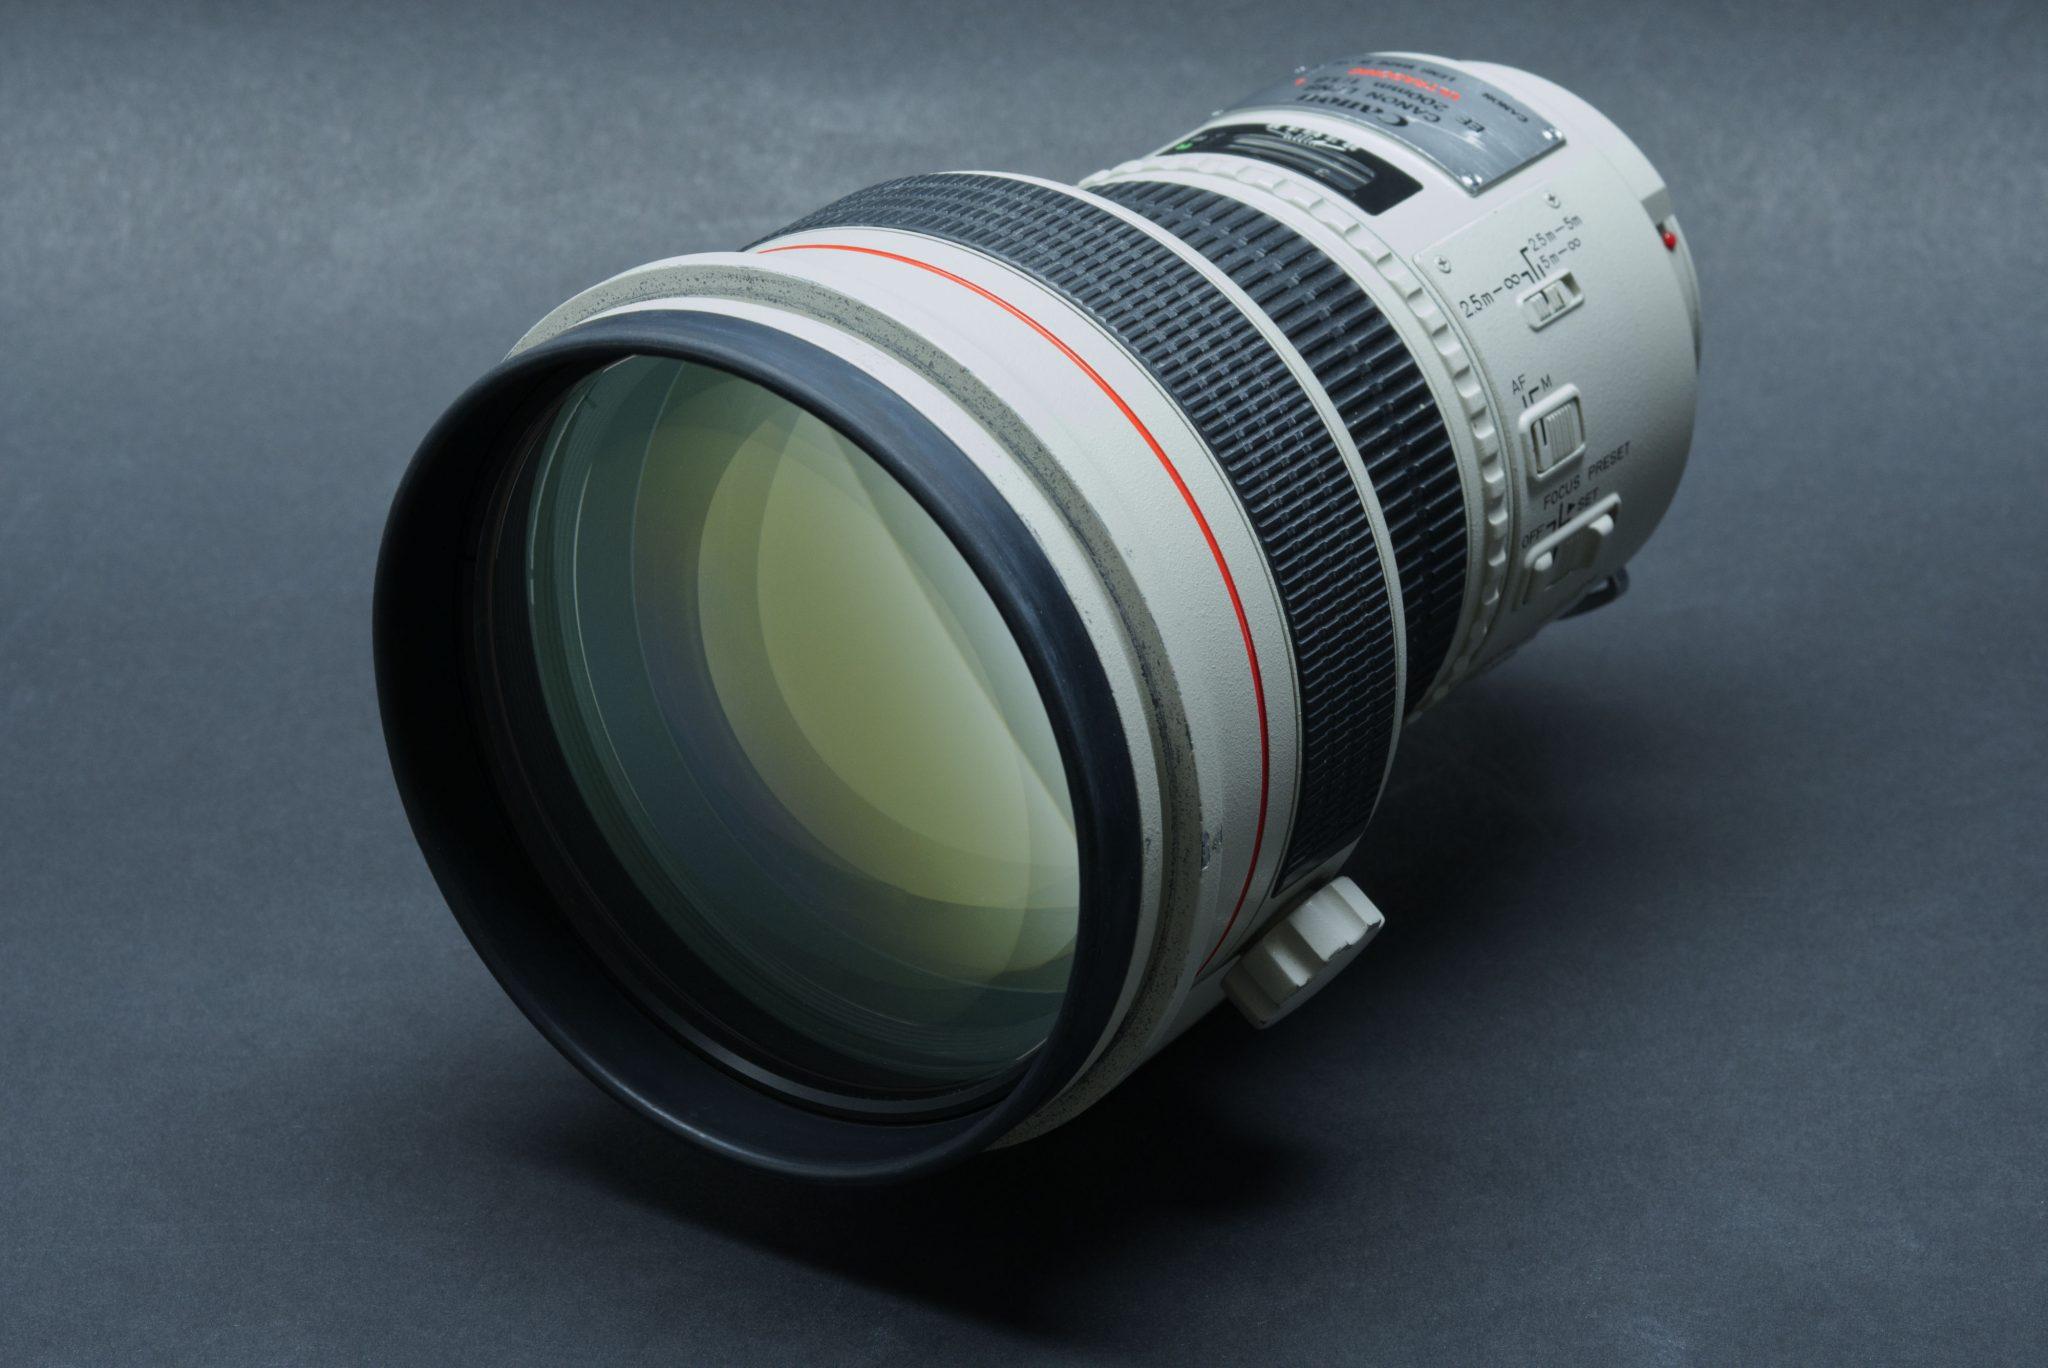 Canon 200mm f/1.8